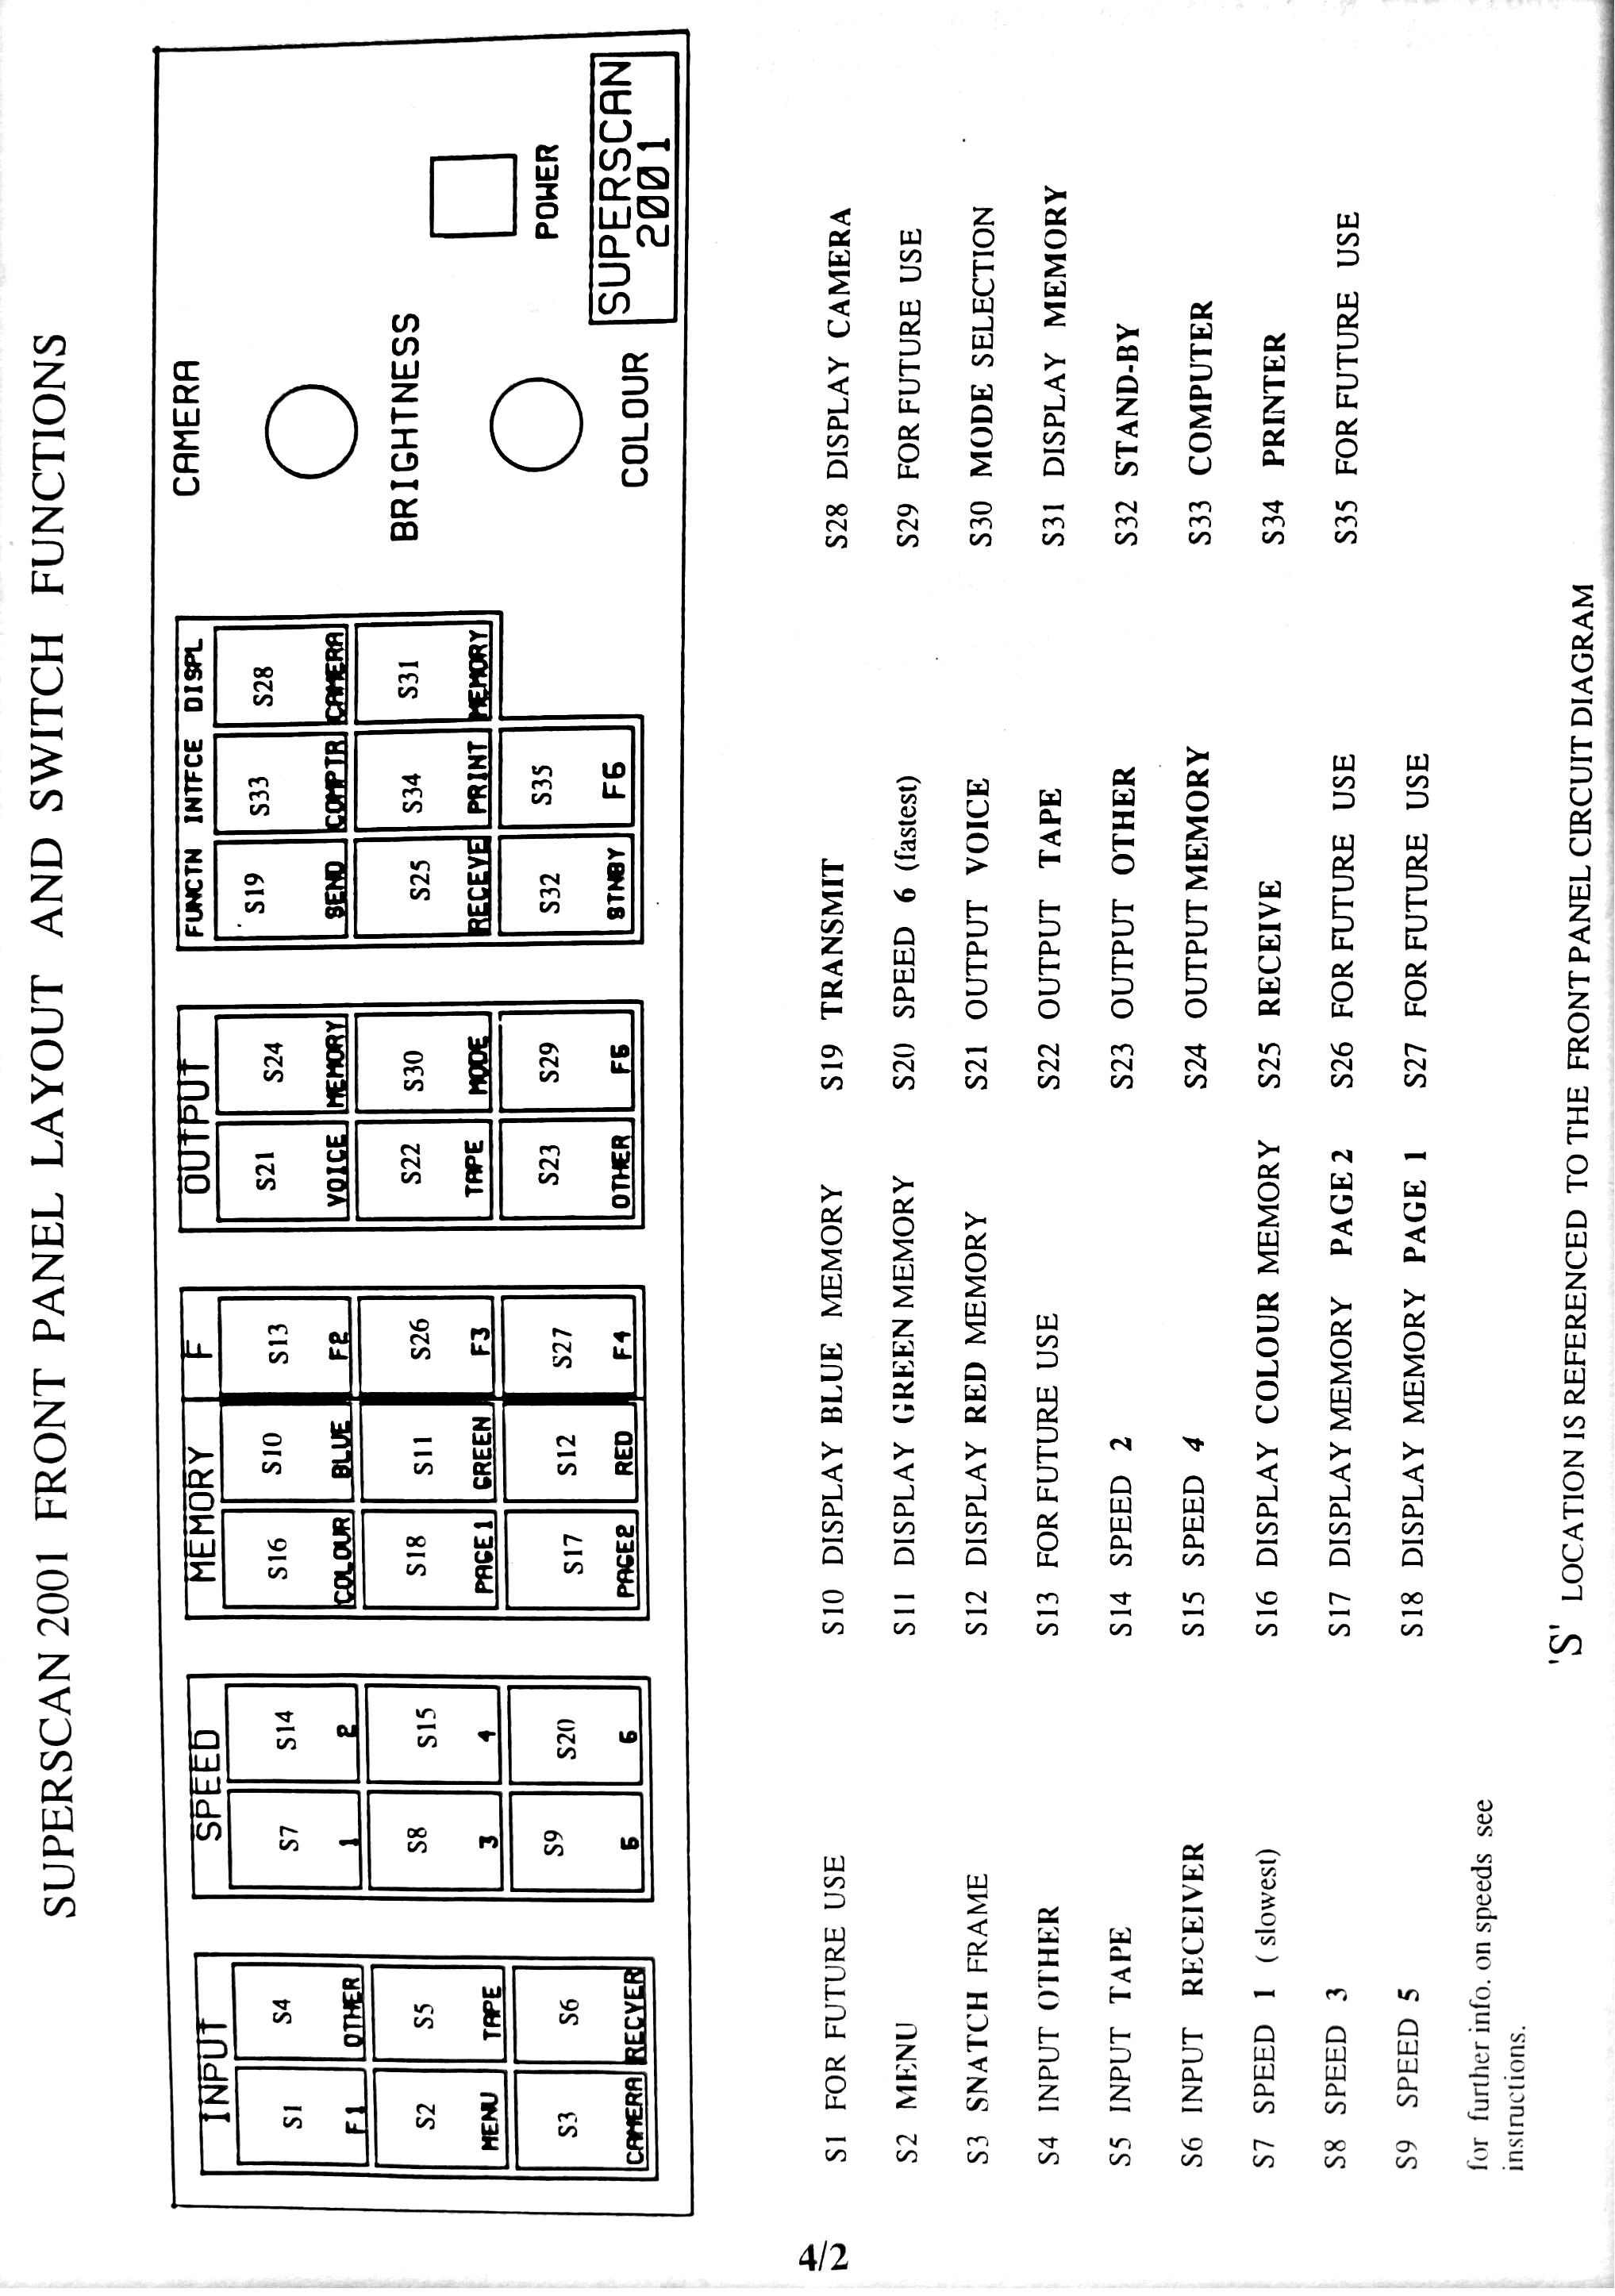 bruxy  superscan 2001 documentation